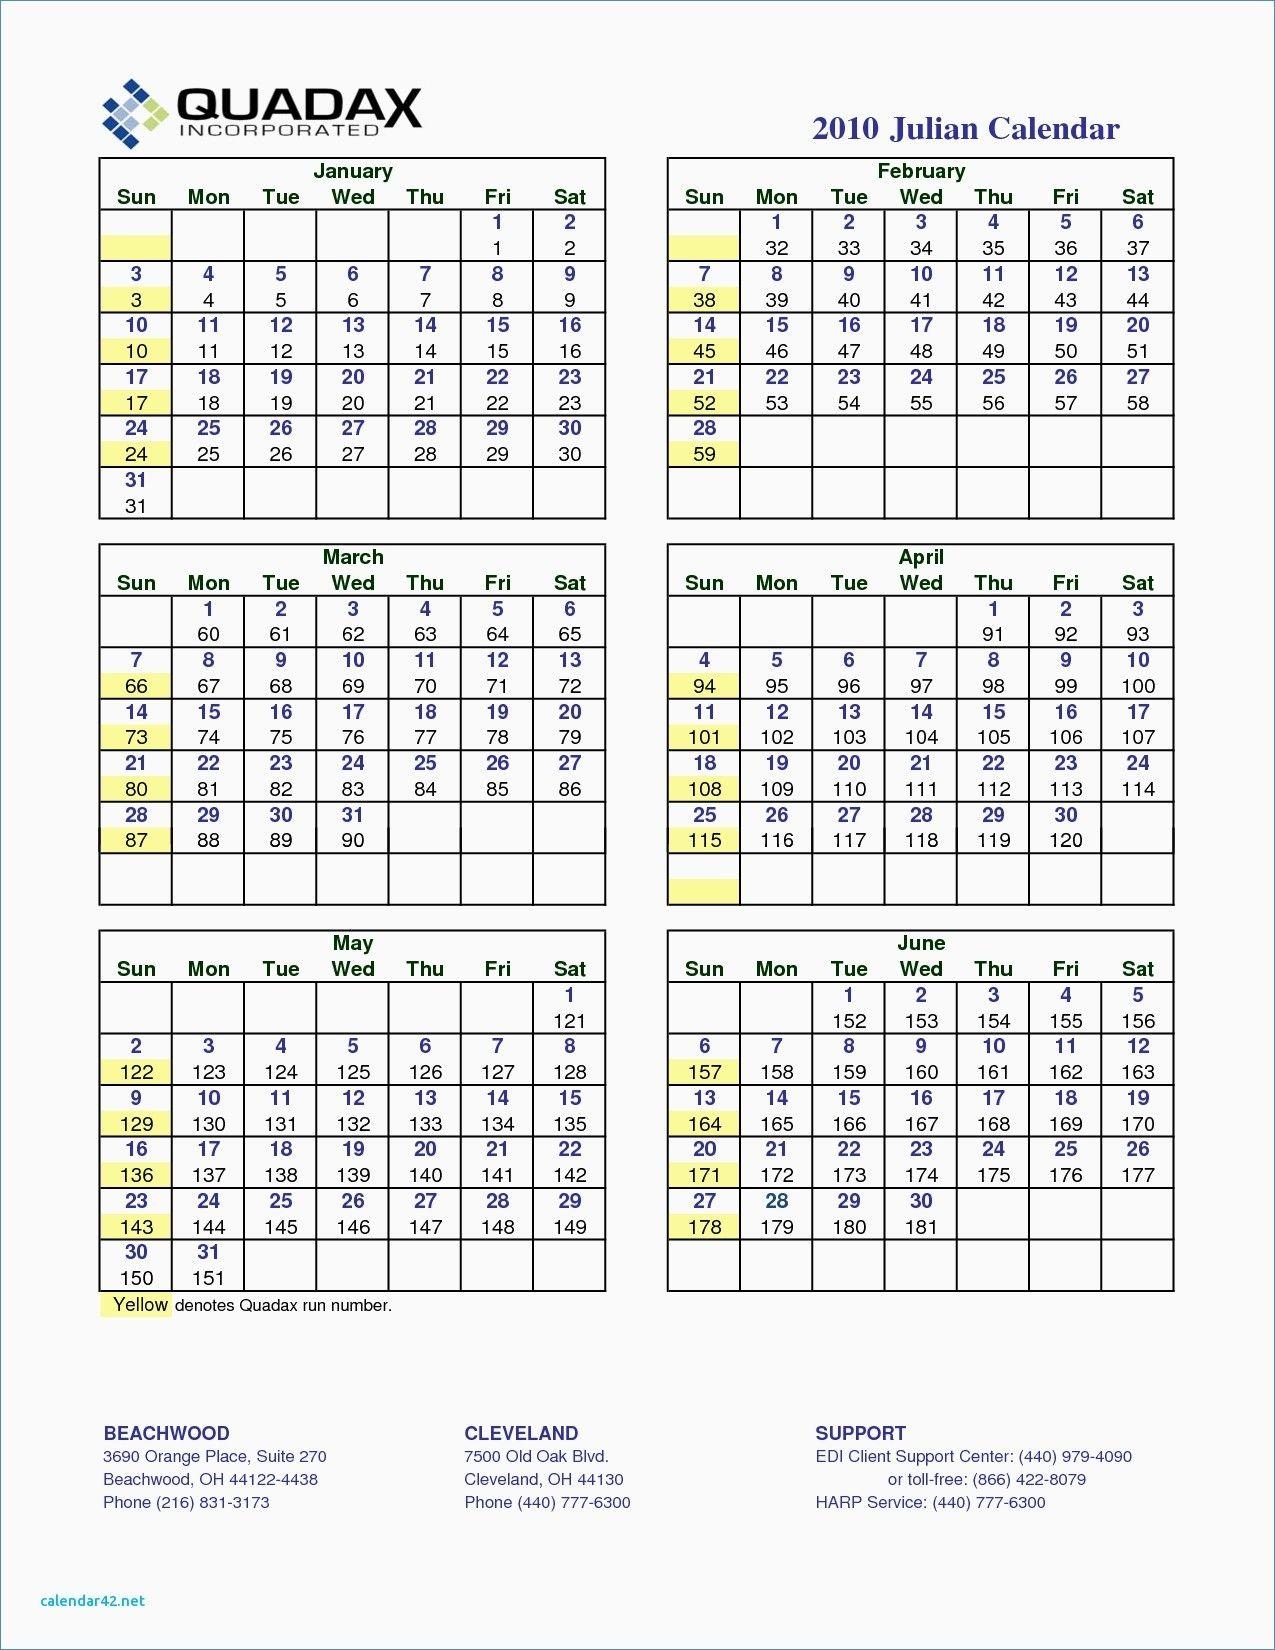 Julian Calendar 2019 Quadax July 2018 Calendar Sri Lanka within Quadax Julian Calendar